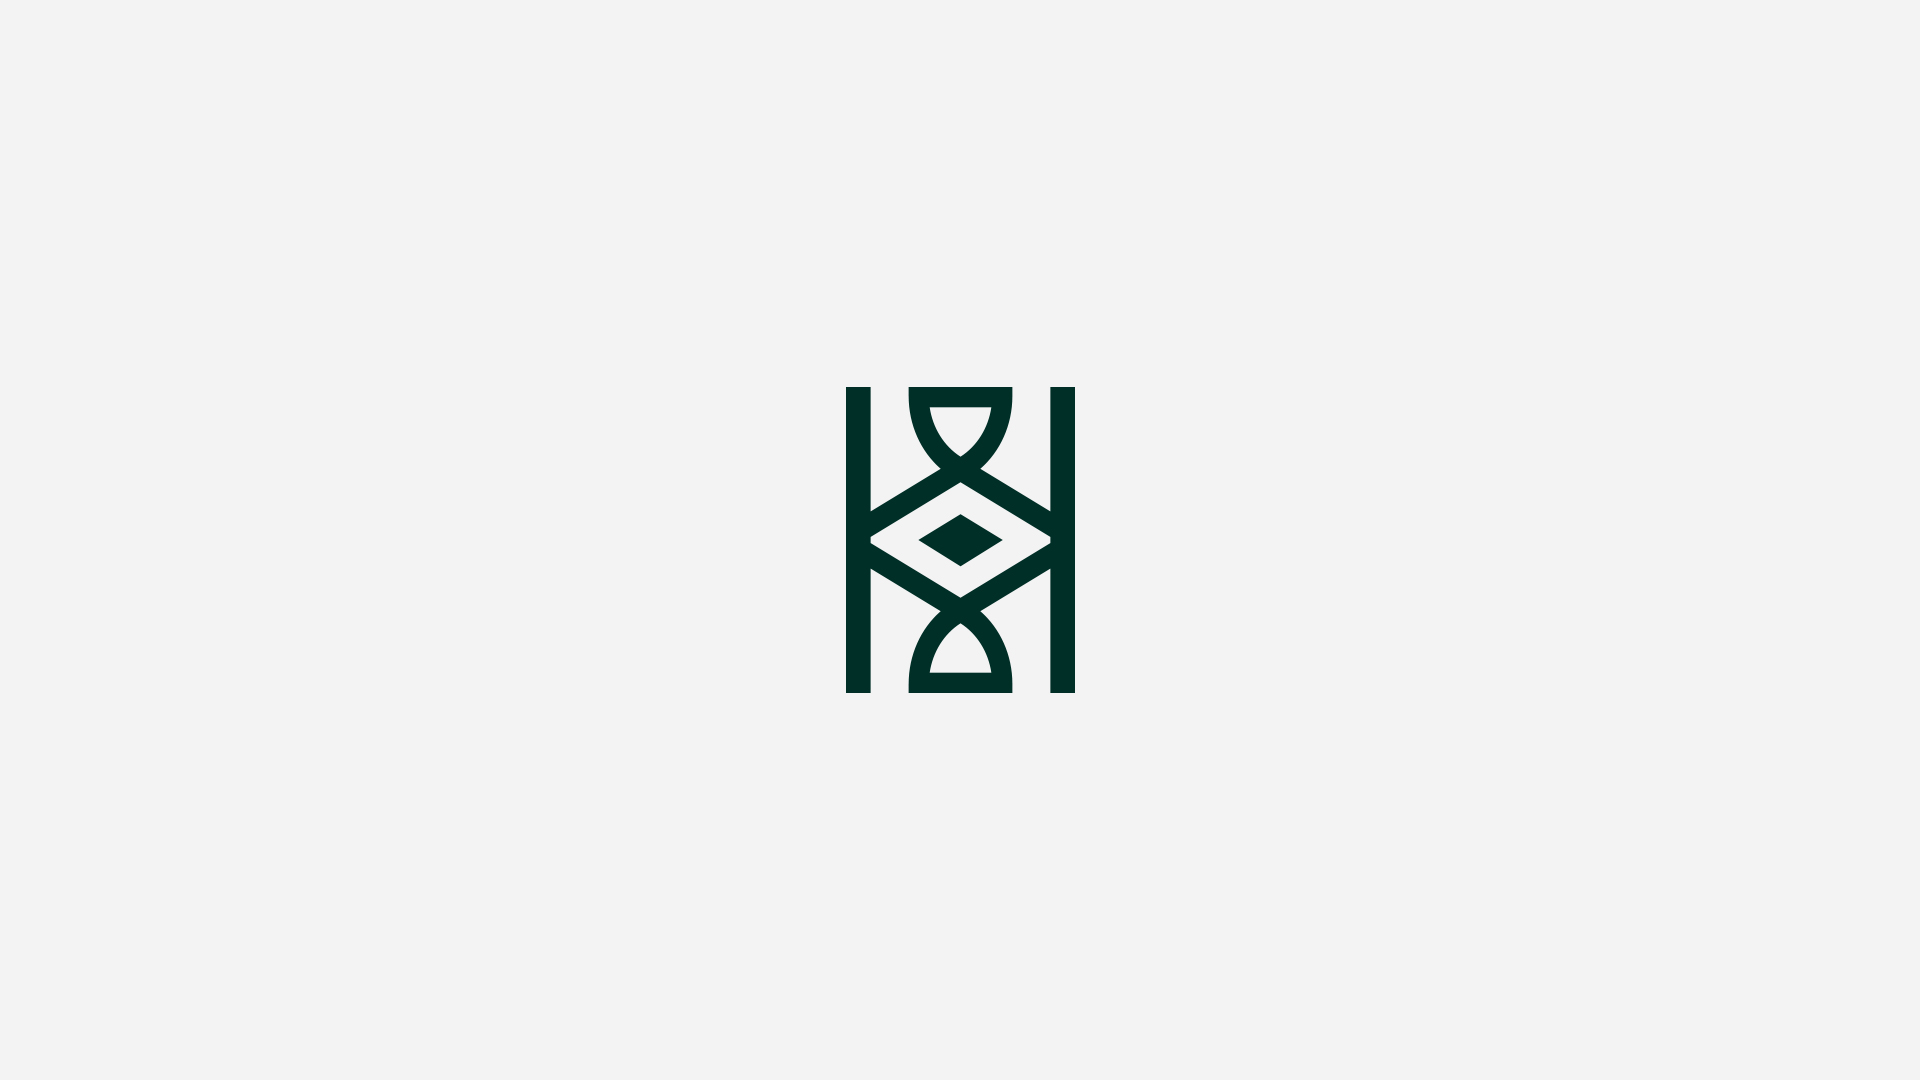 kwaf-logo_5